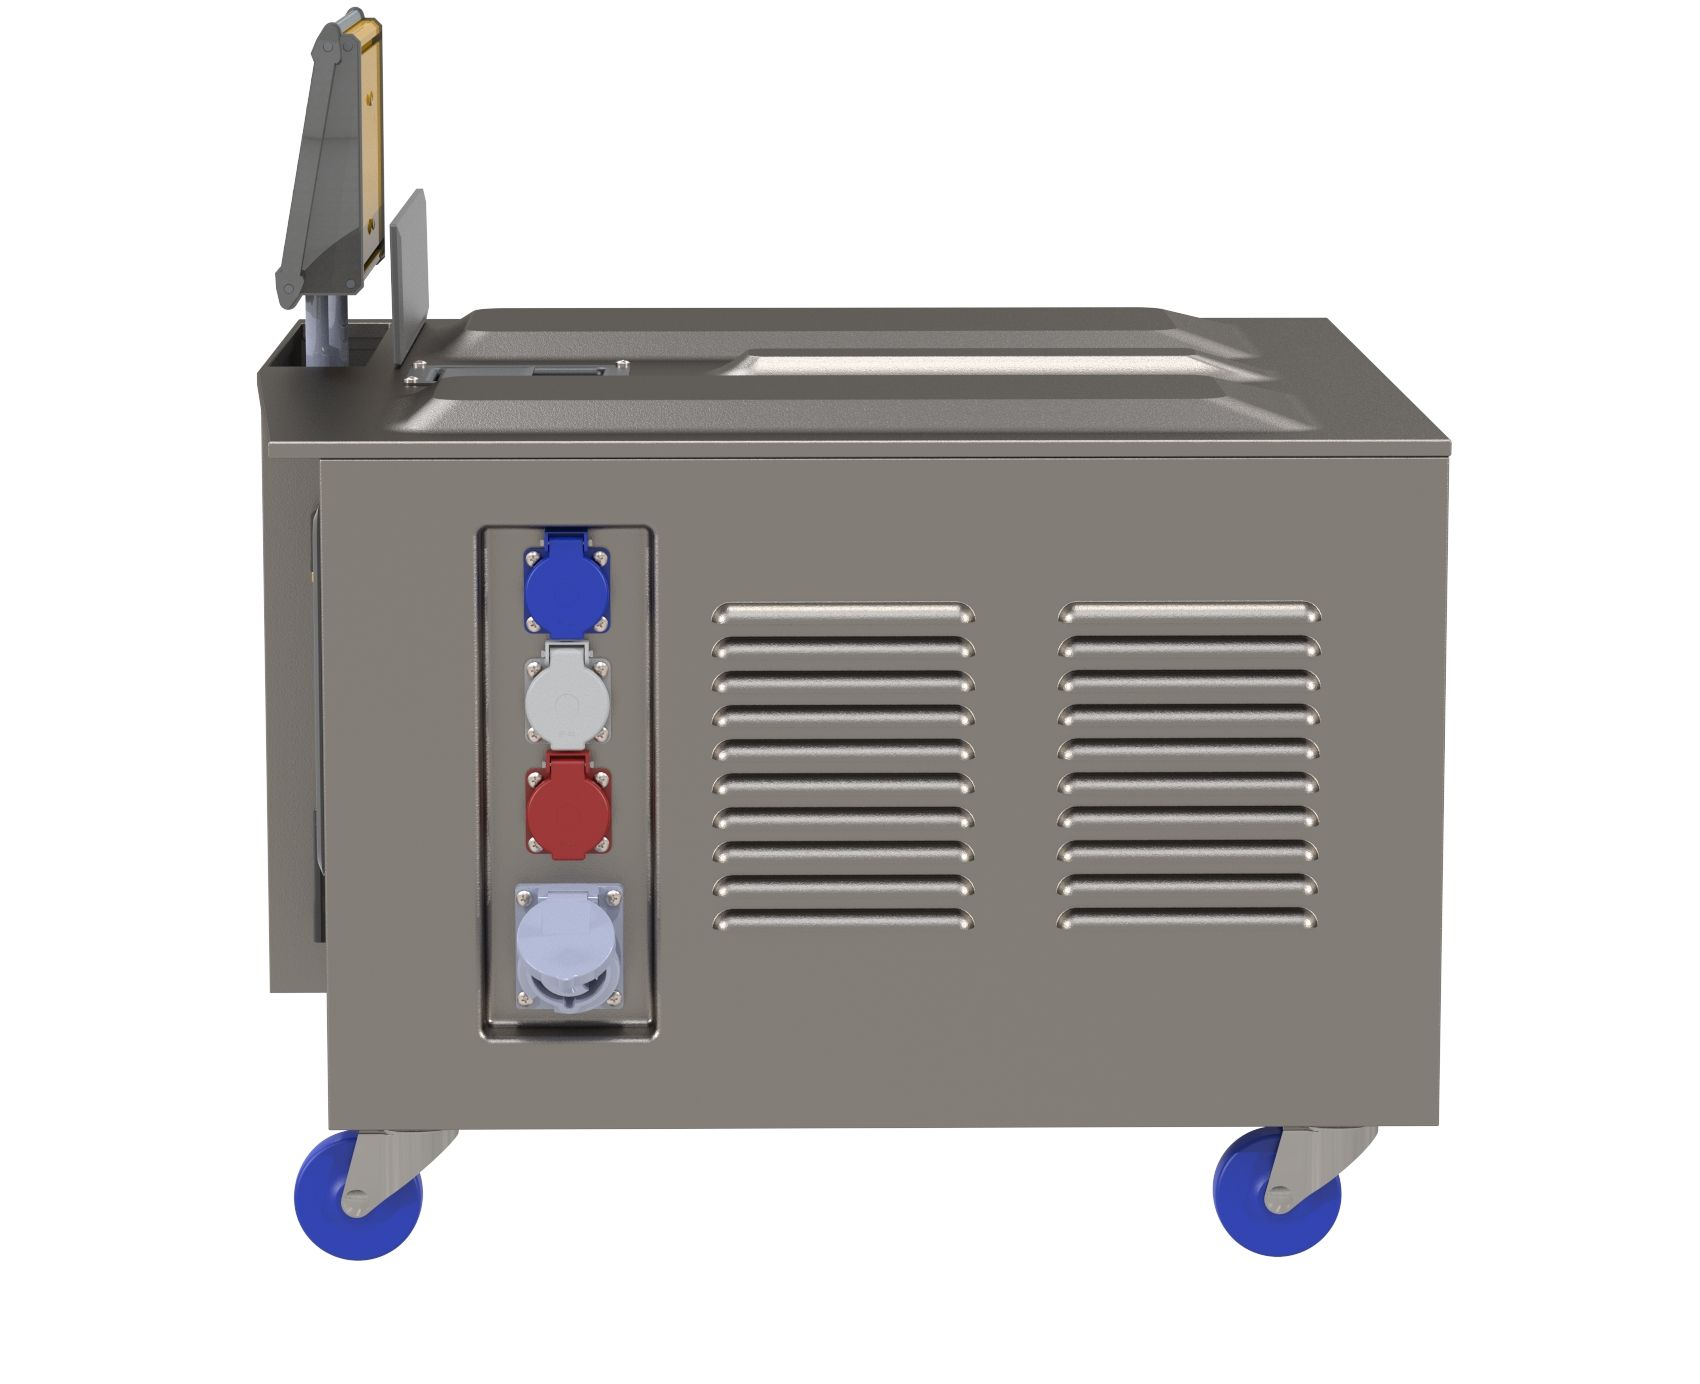 10kw Magnetic Generator 2020 Goruntuler Ile